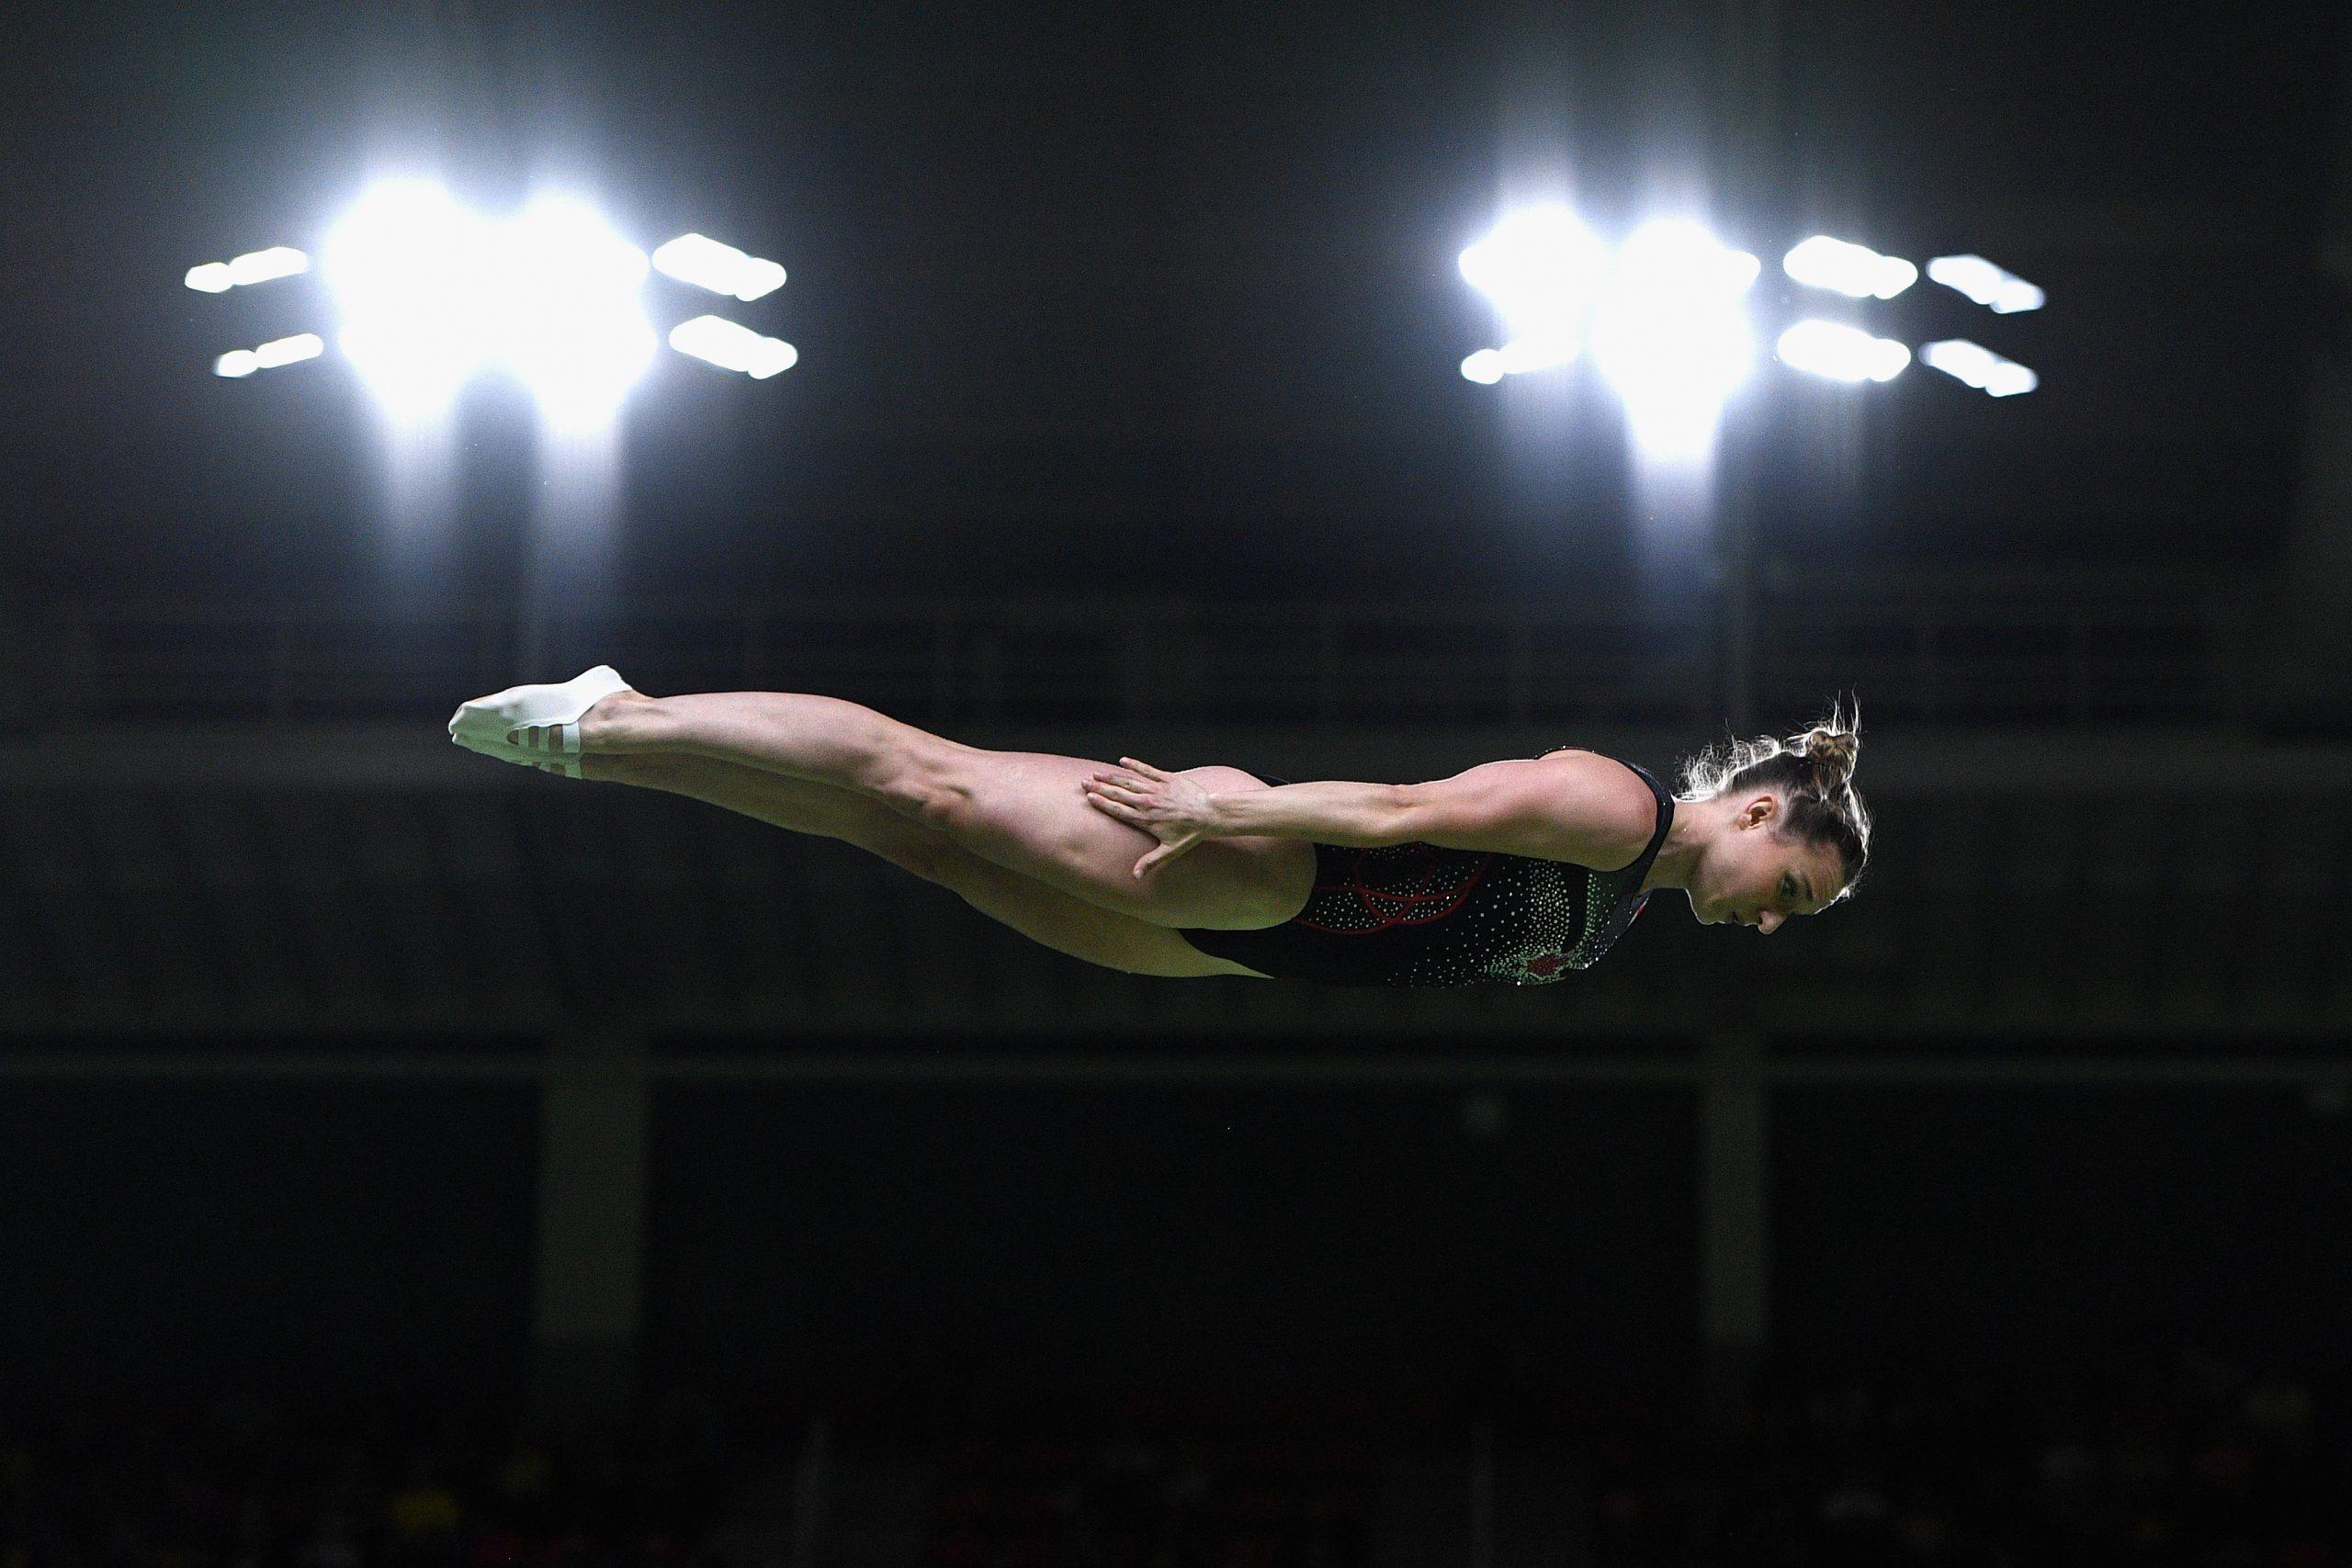 Uen athlète en pleine figure de trampoline.